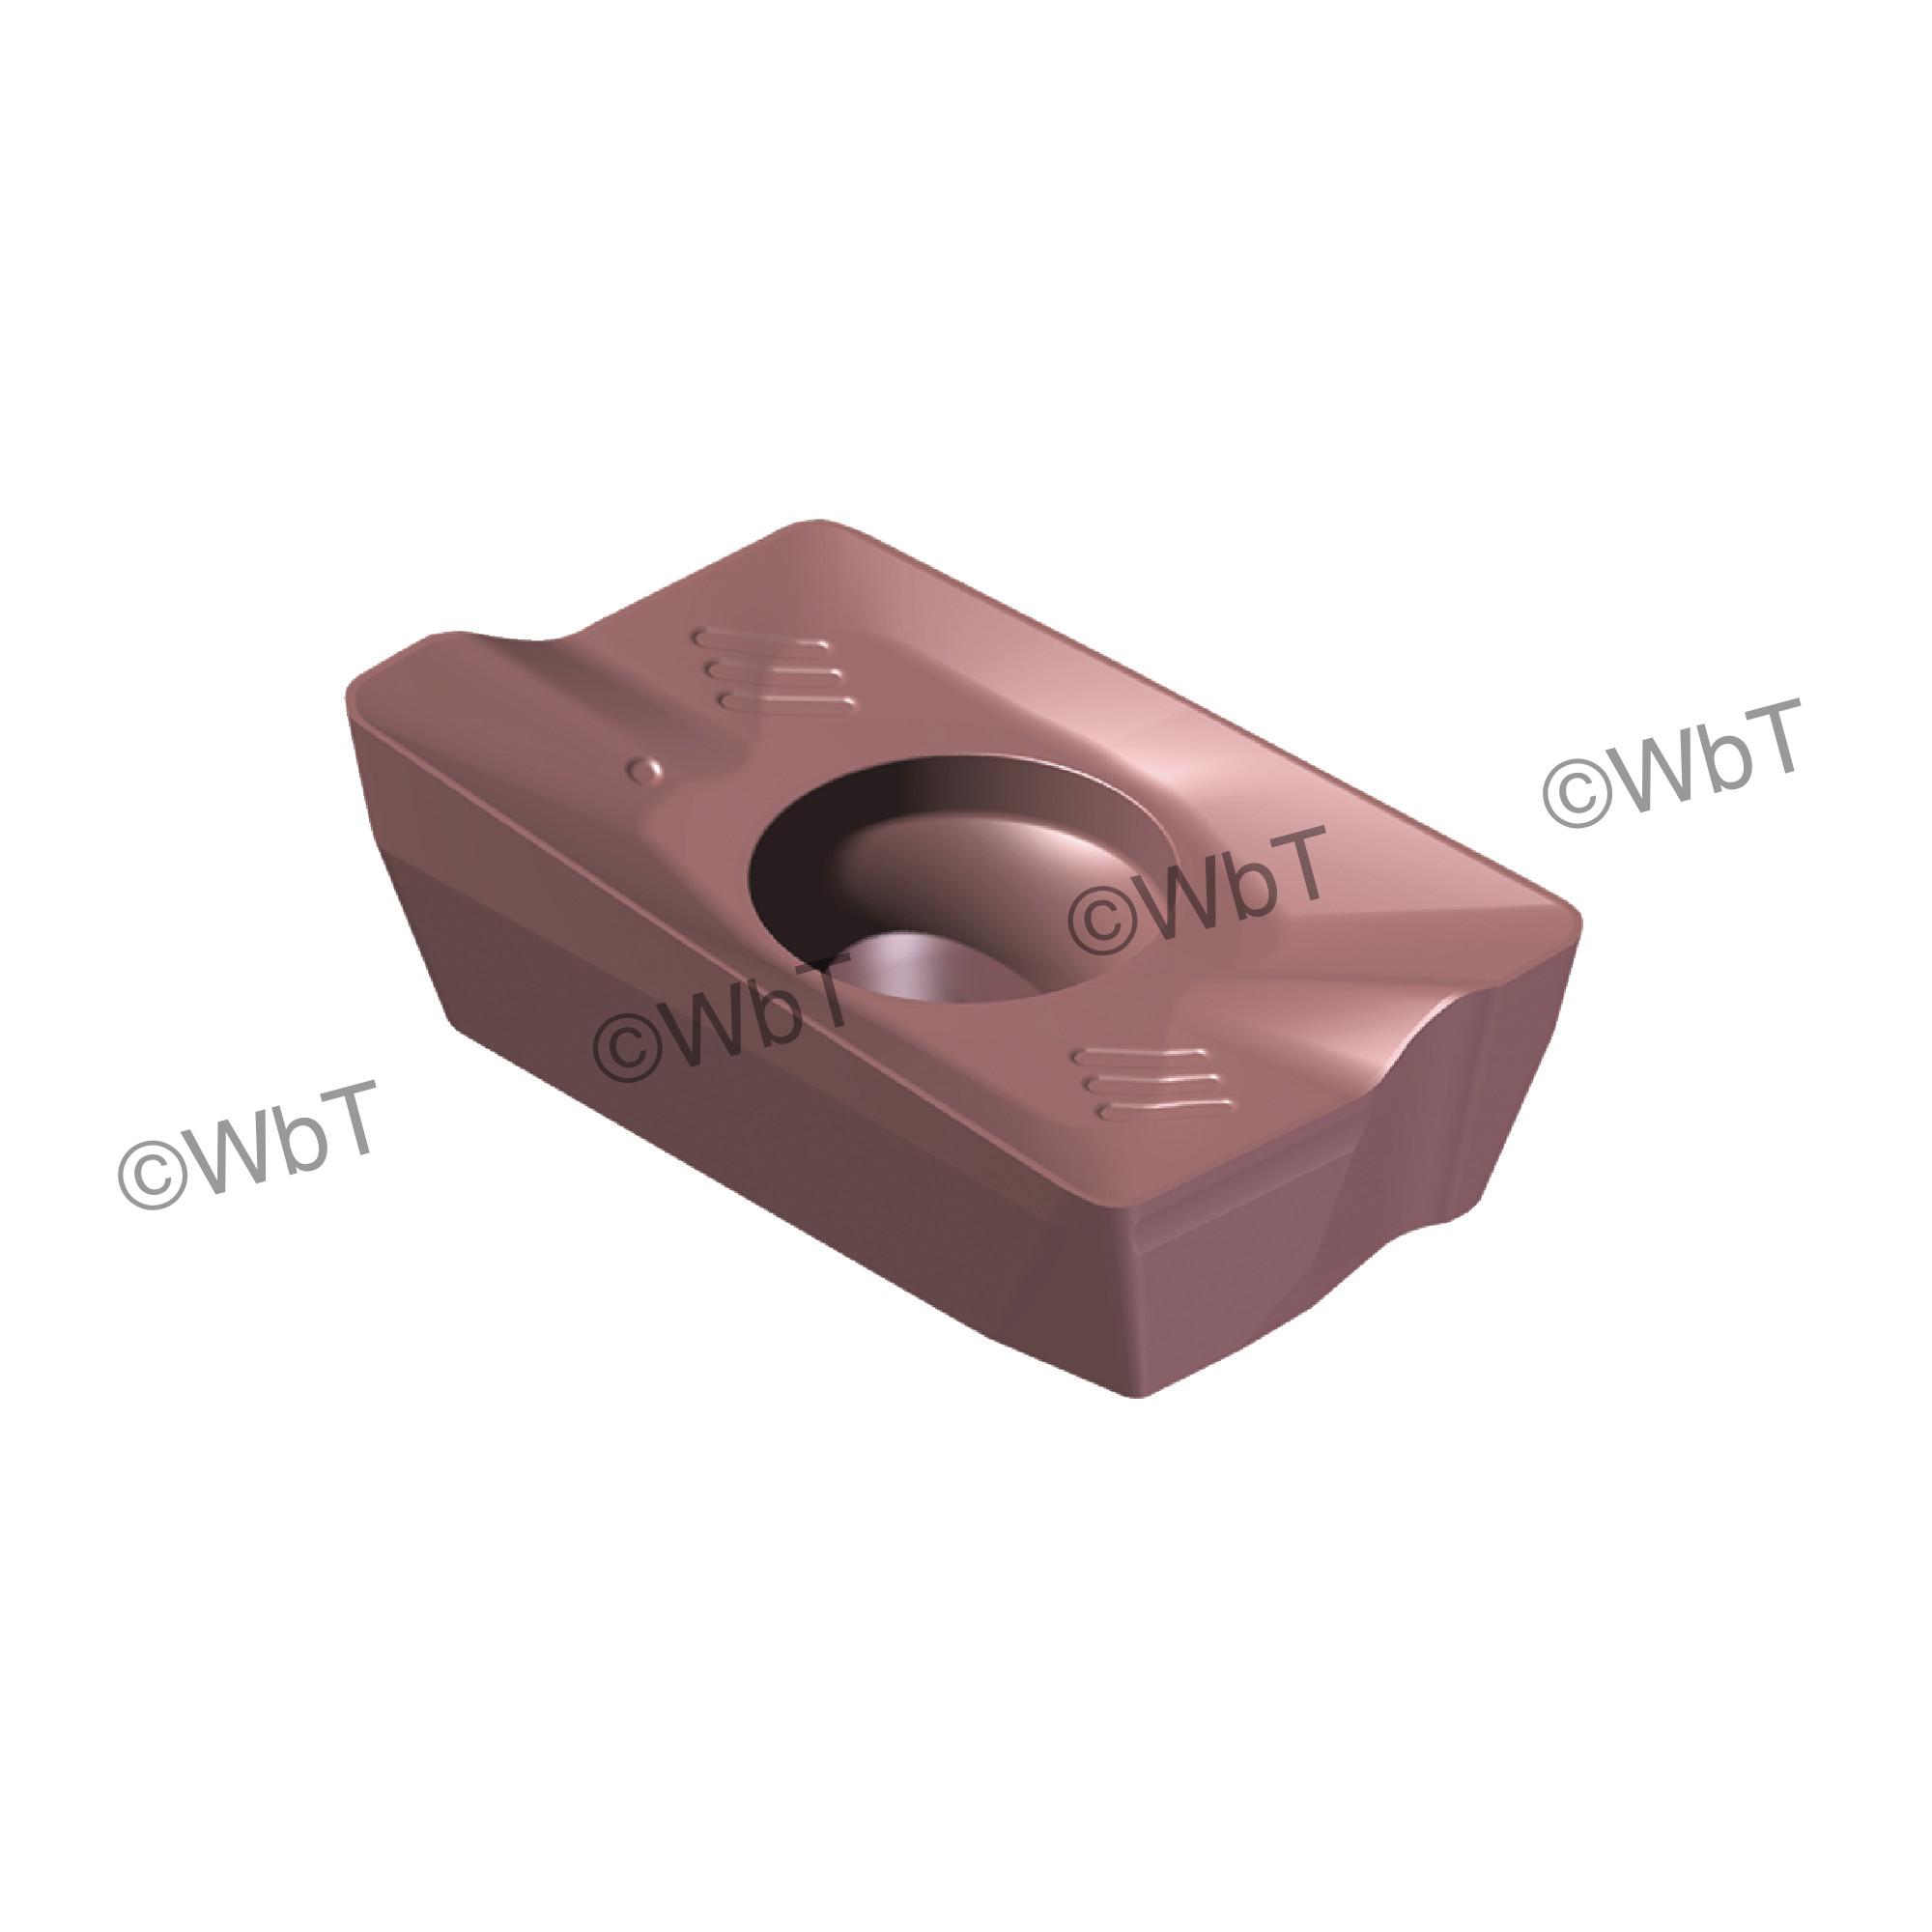 AKUMA - APKT1604PDR-M1 PM15M Parallelogram / Indexable Carbide Milling Insert